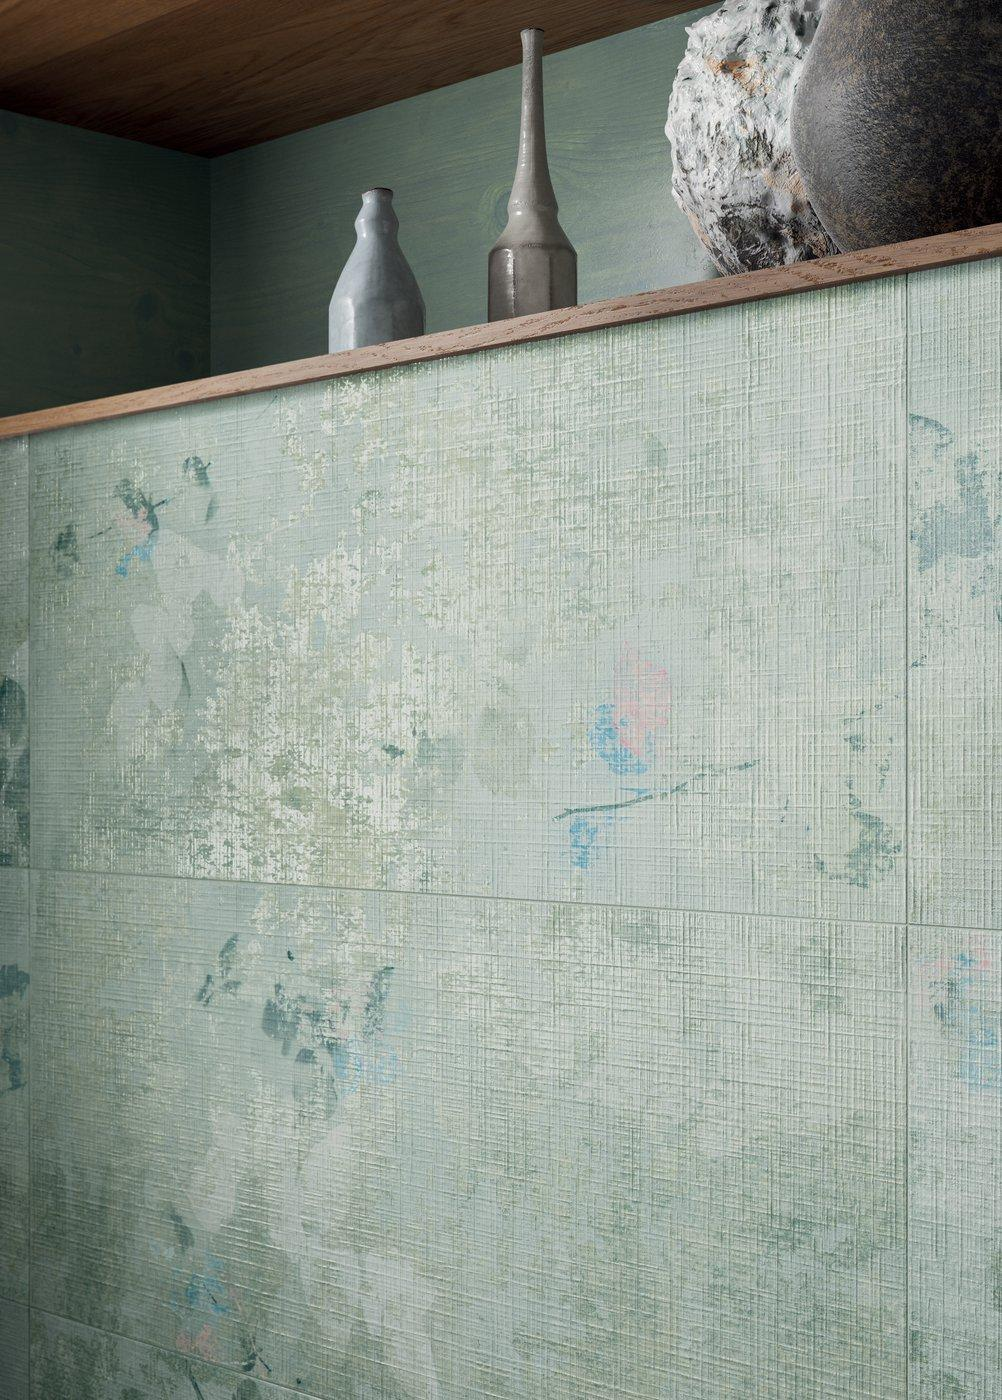 Zelená v kúpeľni - Obrázok č. 20